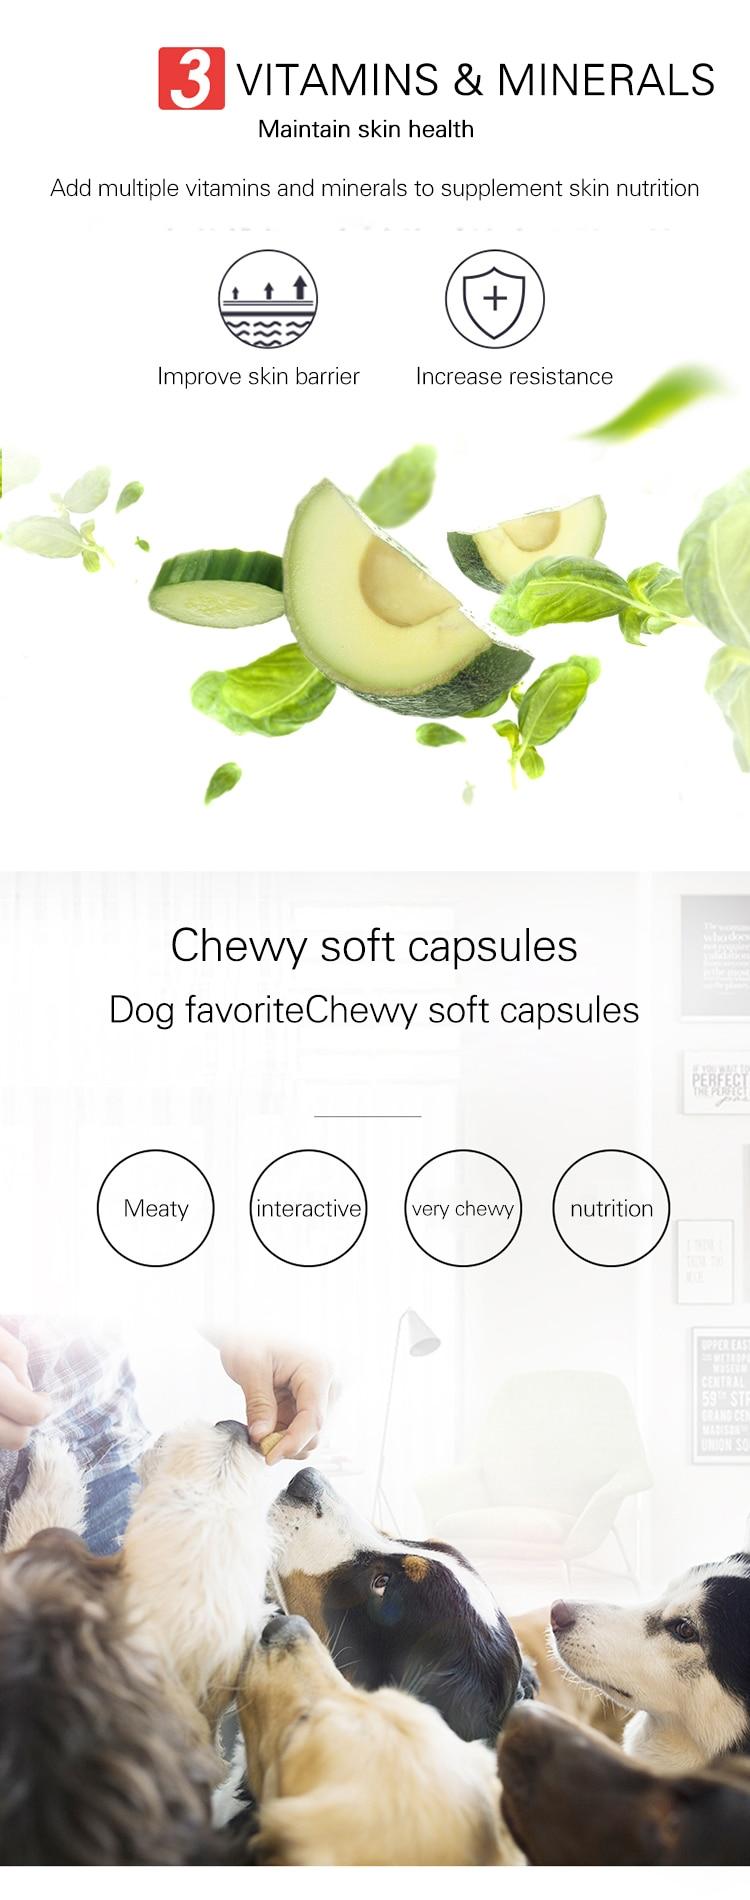 Wowo питомец собака лецитин водорослей DHA рыбий жир КРАСОТА ПОРОШОК яркие волосы уход за кожей Тедди золотистый ретривер питомец Лецитин